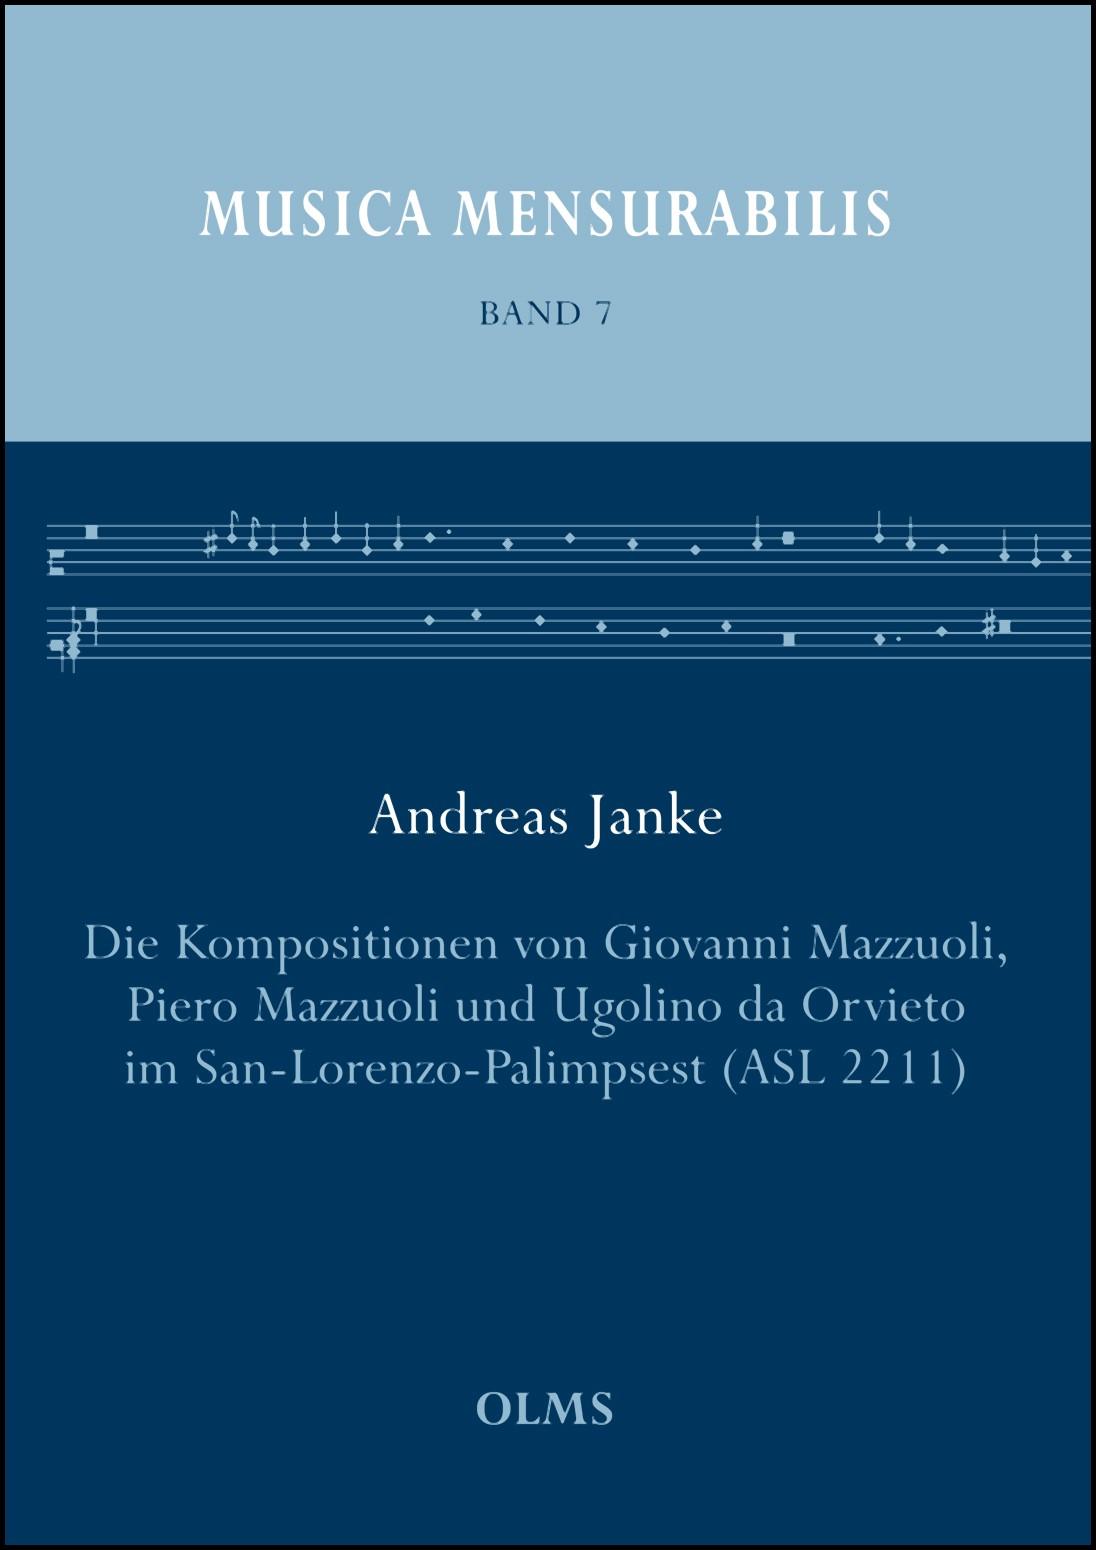 Abbildung von Janke   Die Kompositionen von Giovanni Mazzuoli, Piero Mazzuoli undUgolino da Orvieto im San-Lorenzo-Palimpsest (ASL 2211)   2016   2016